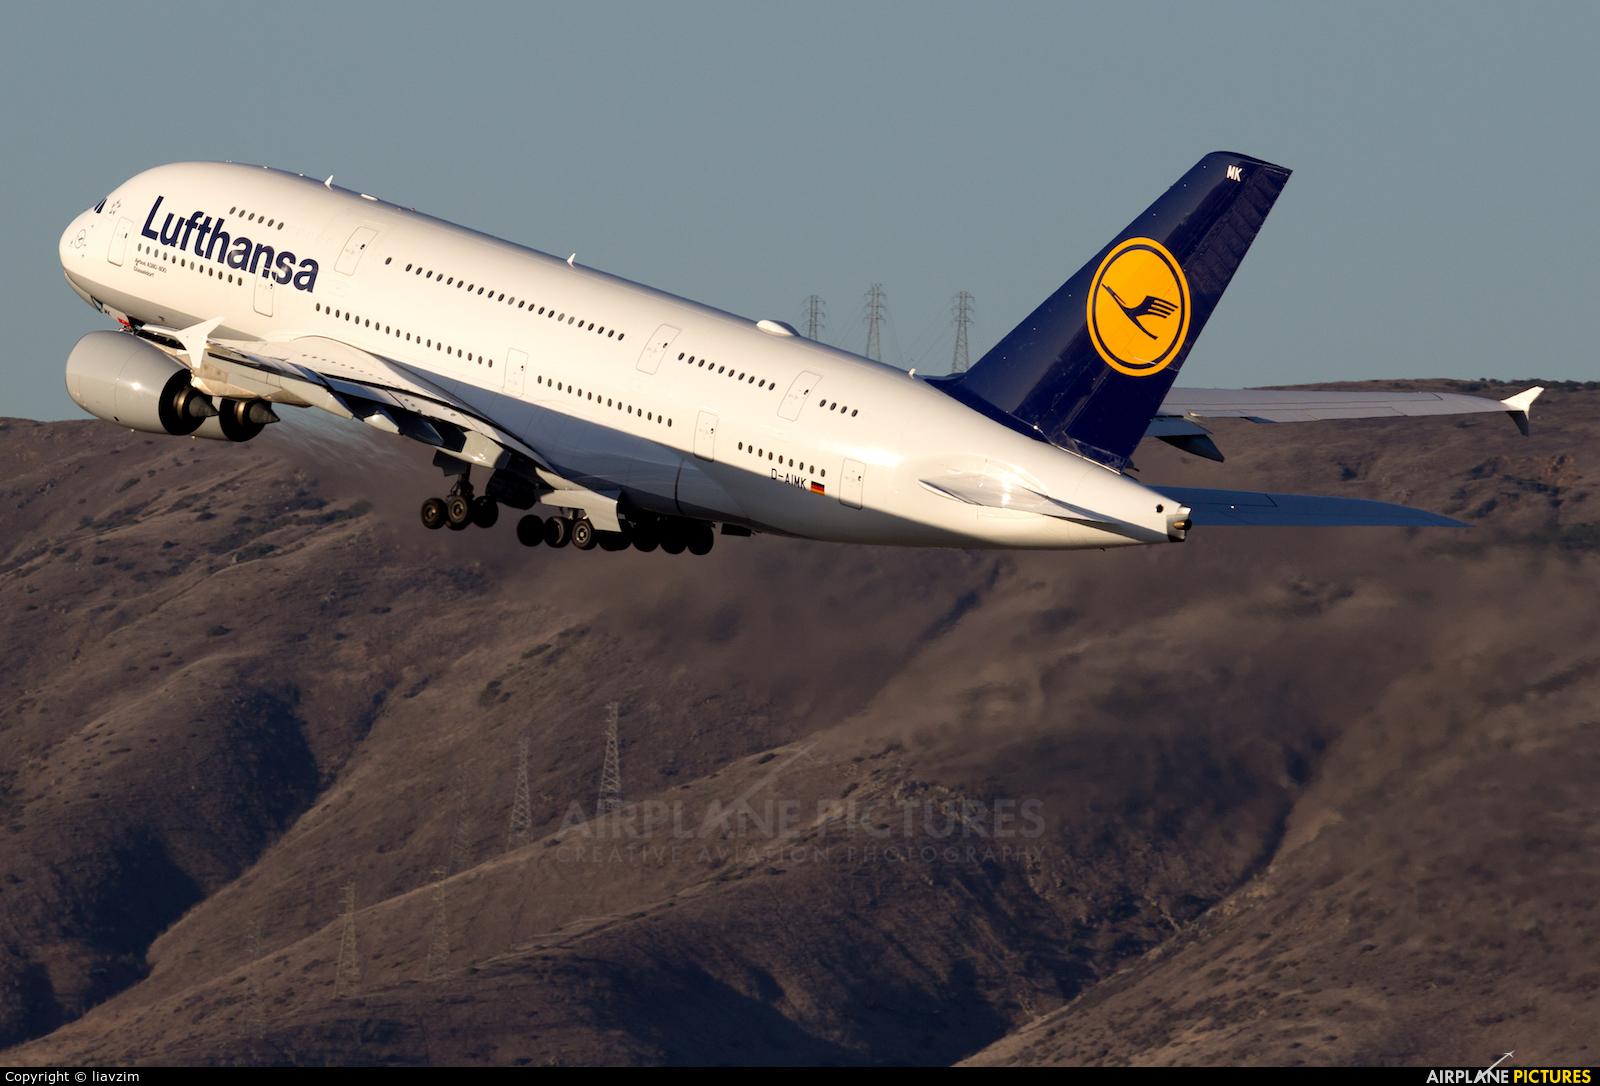 Lufthansa D-AIMK aircraft at San Francisco Intl